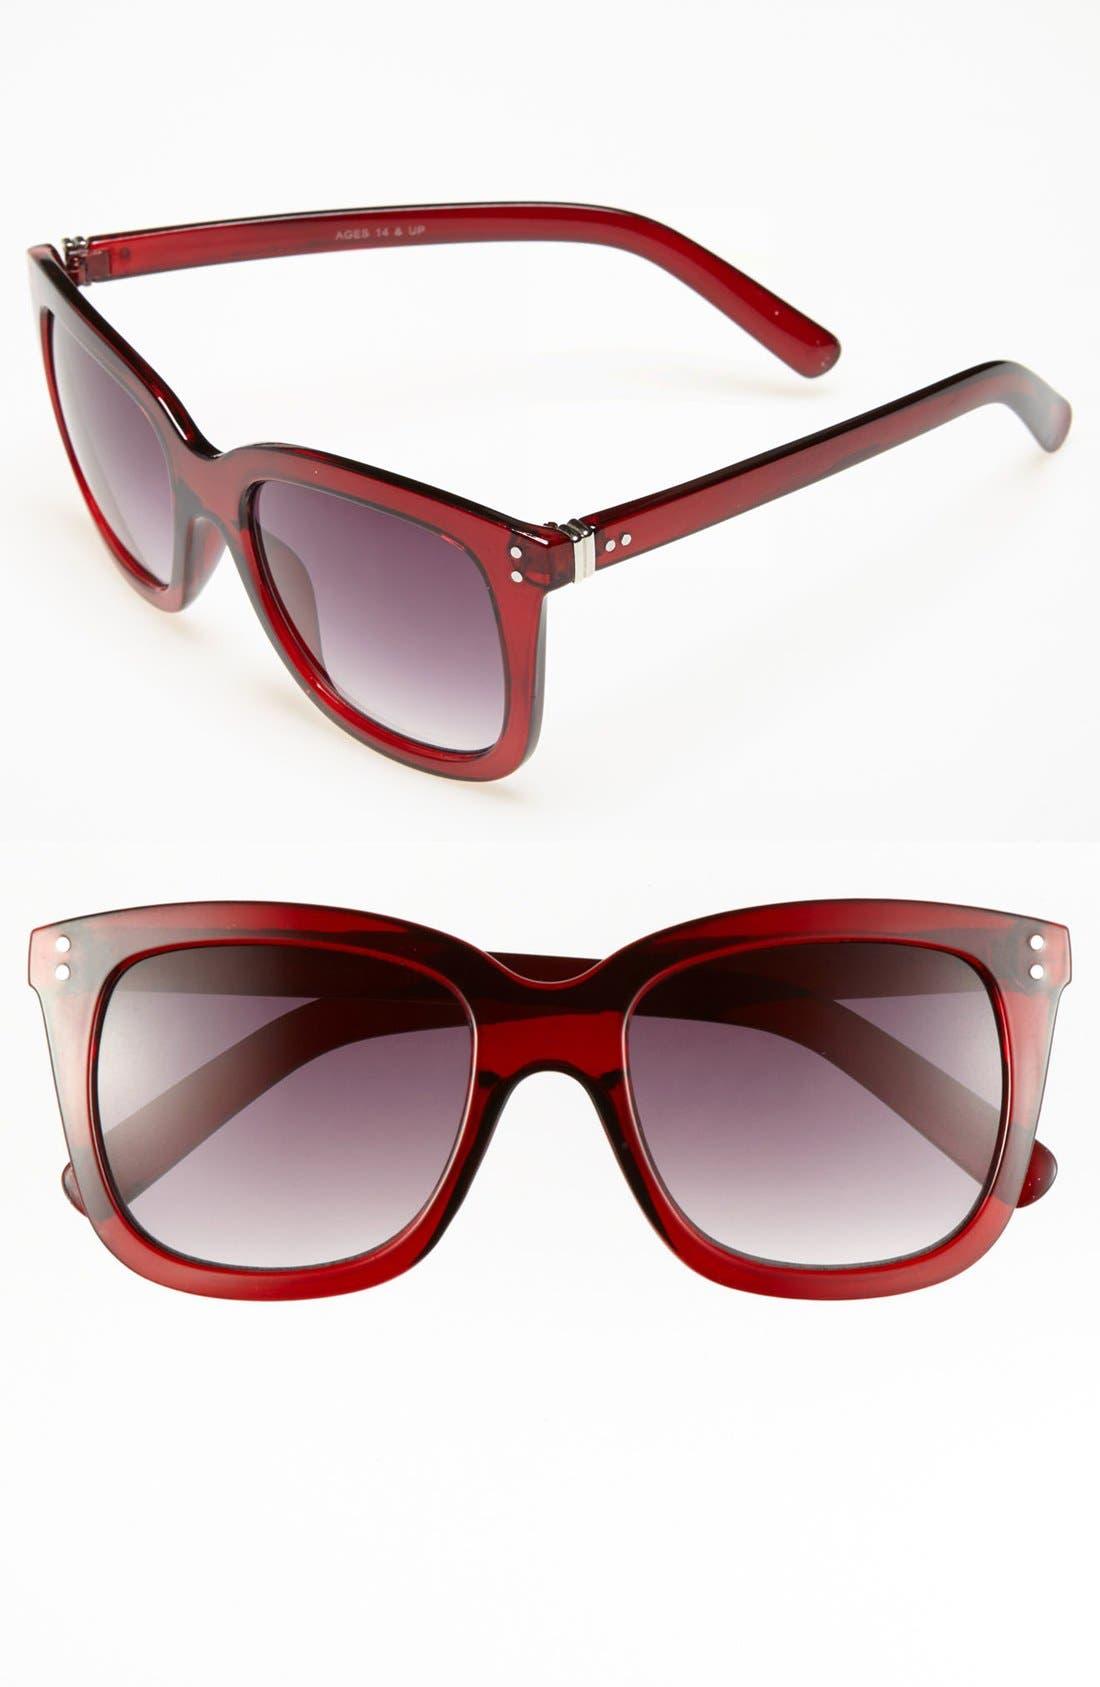 Main Image - FE NY 'Blue Blood' Sunglasses